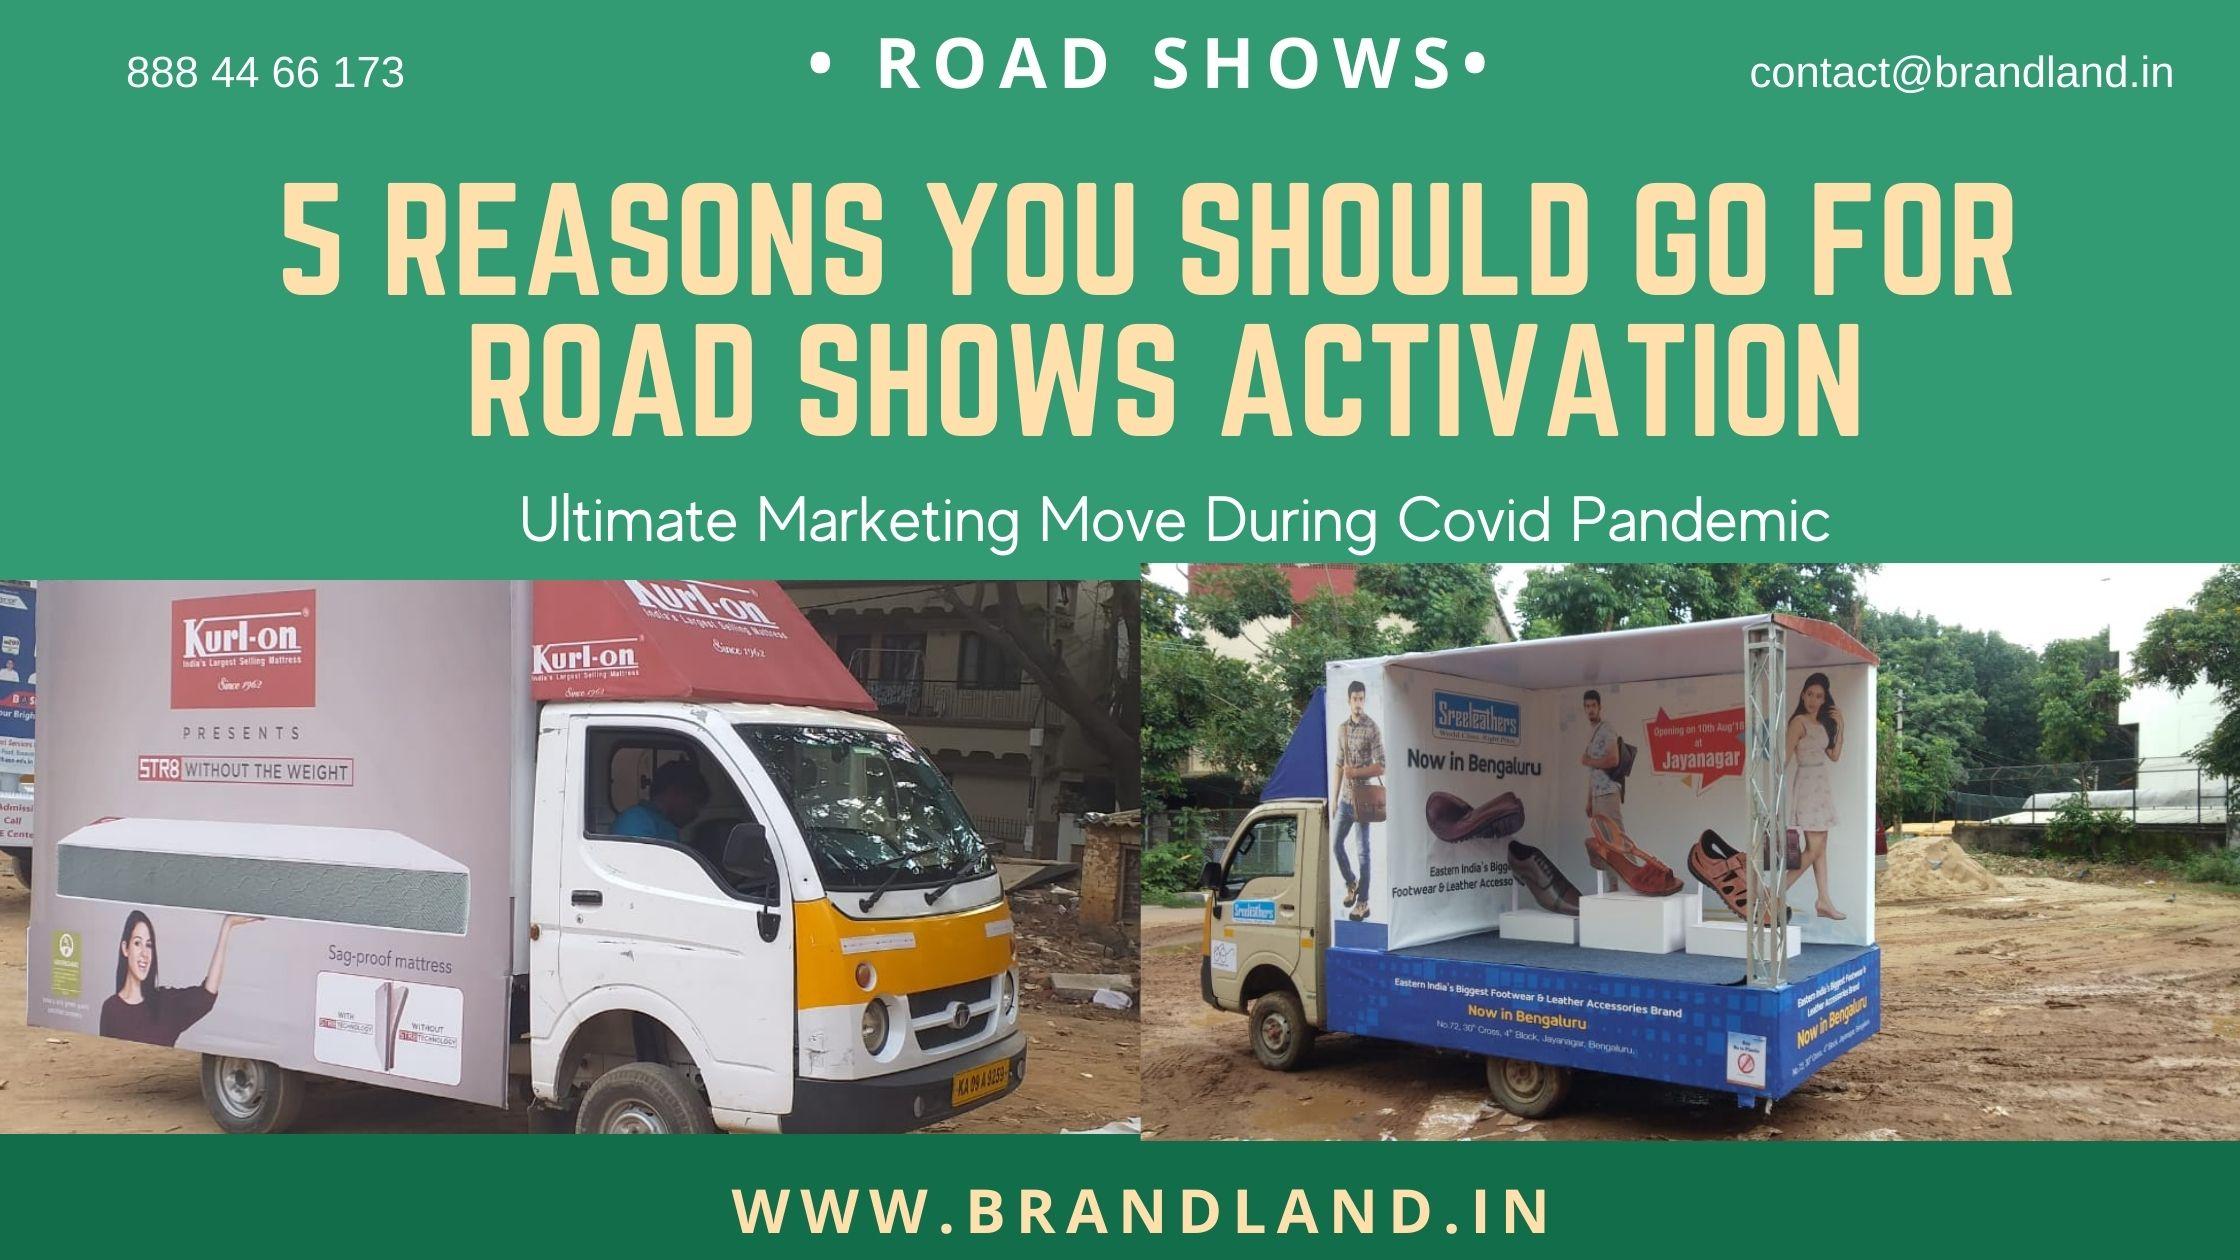 Roadshow activation